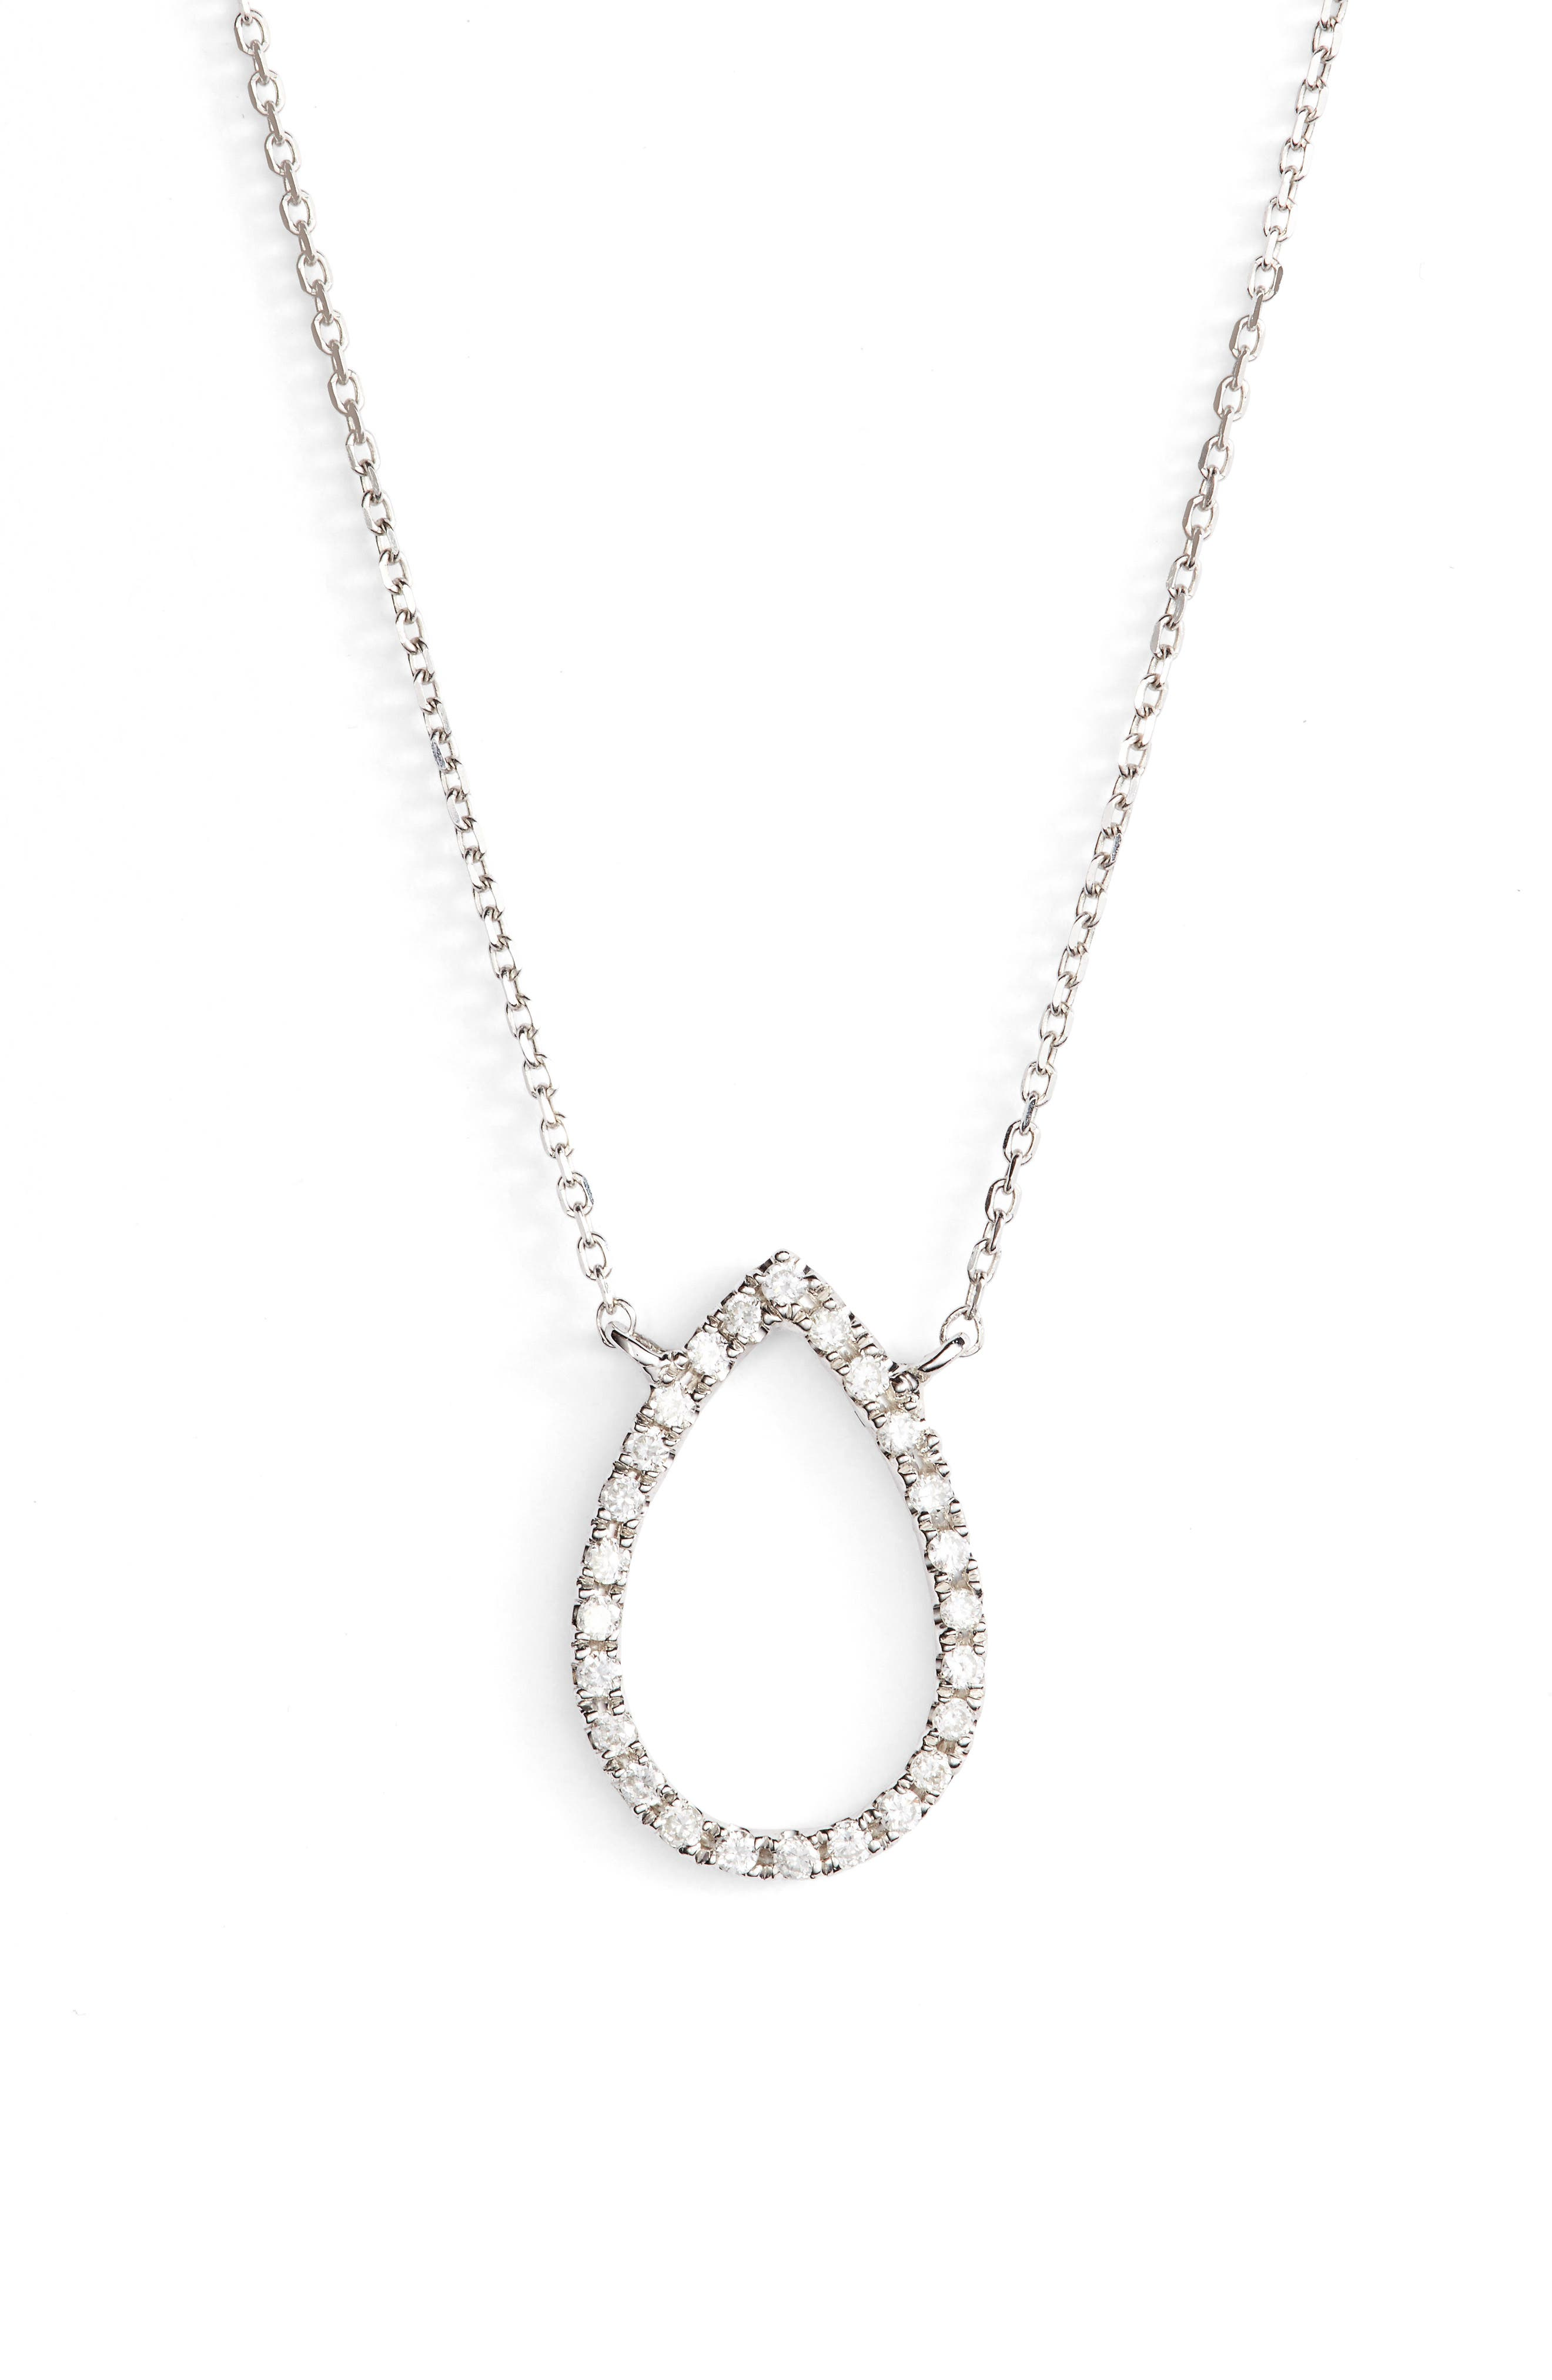 Alternate Image 1 Selected - Dana Rebecca Designs Marquise Diamond Pendant Necklace